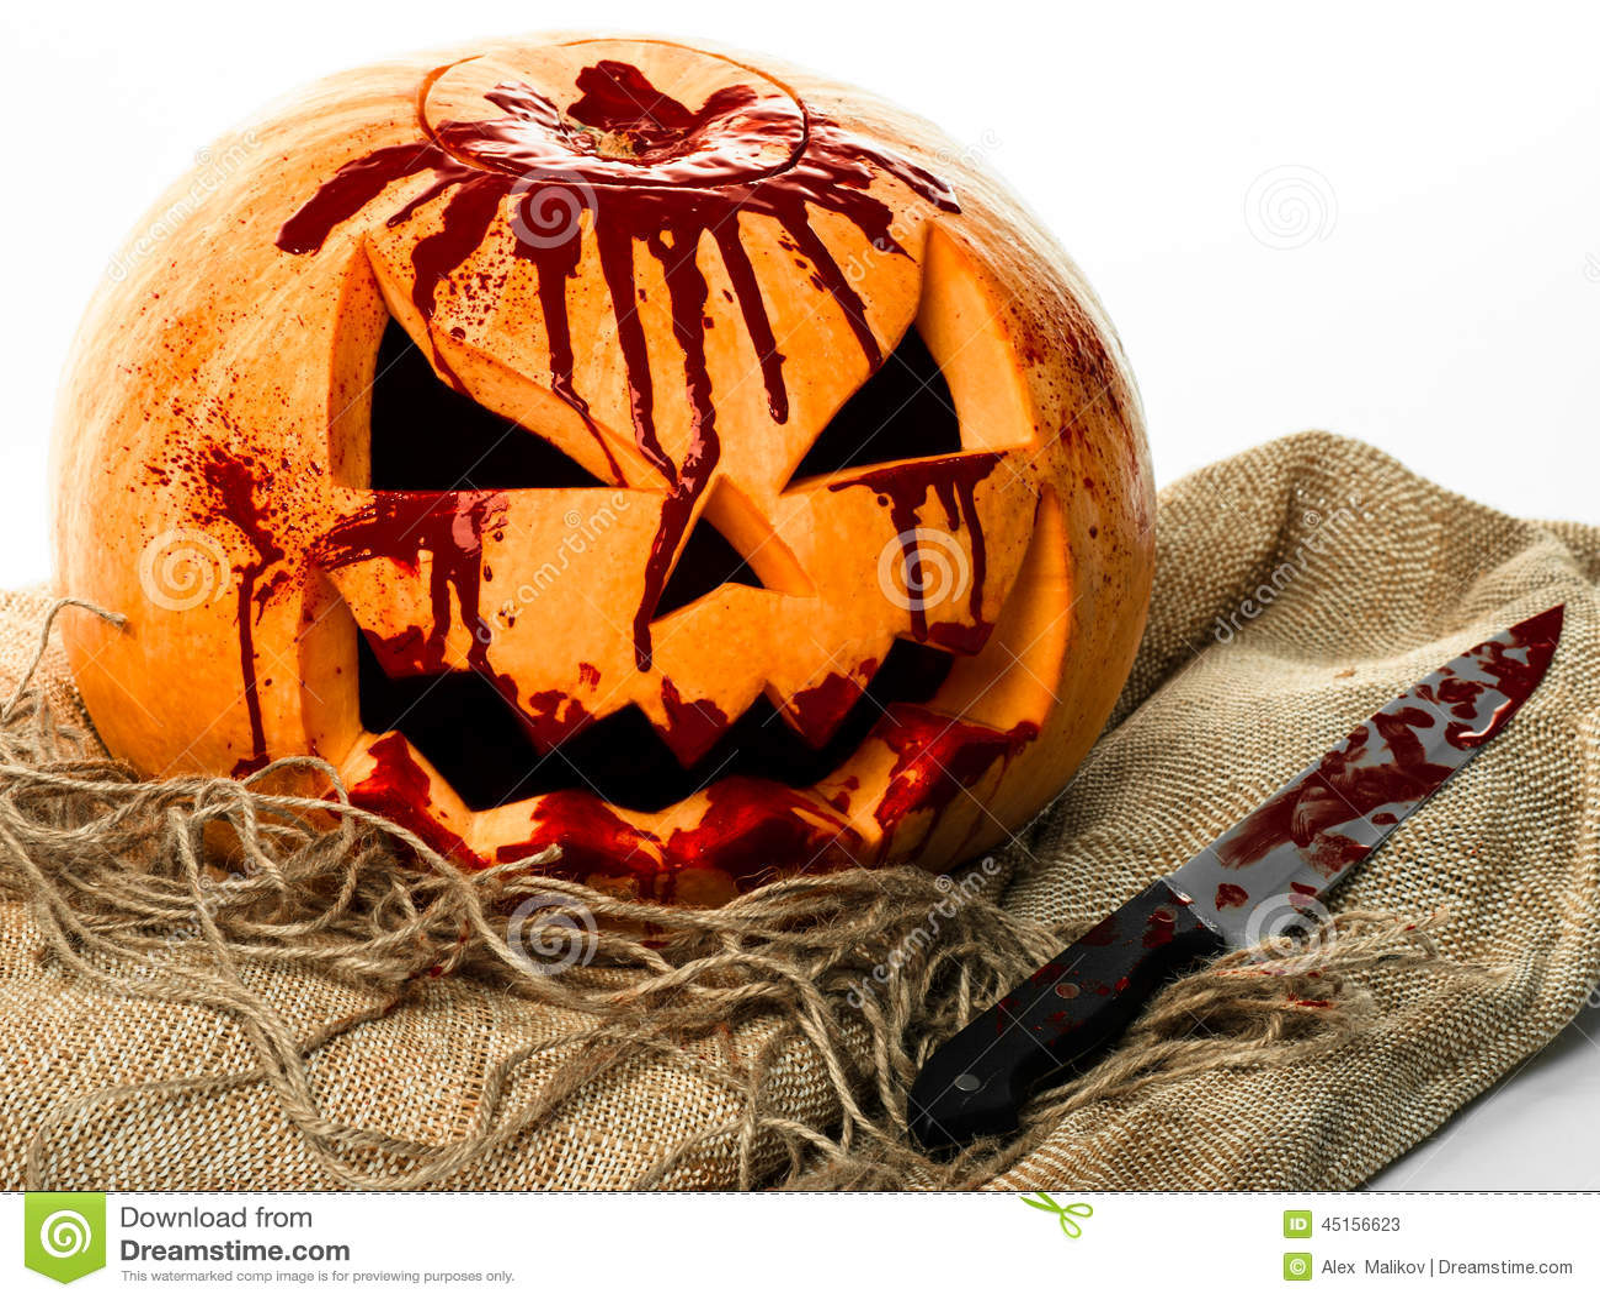 bloody pumpkin jack lantern pumpkin halloween halloween theme